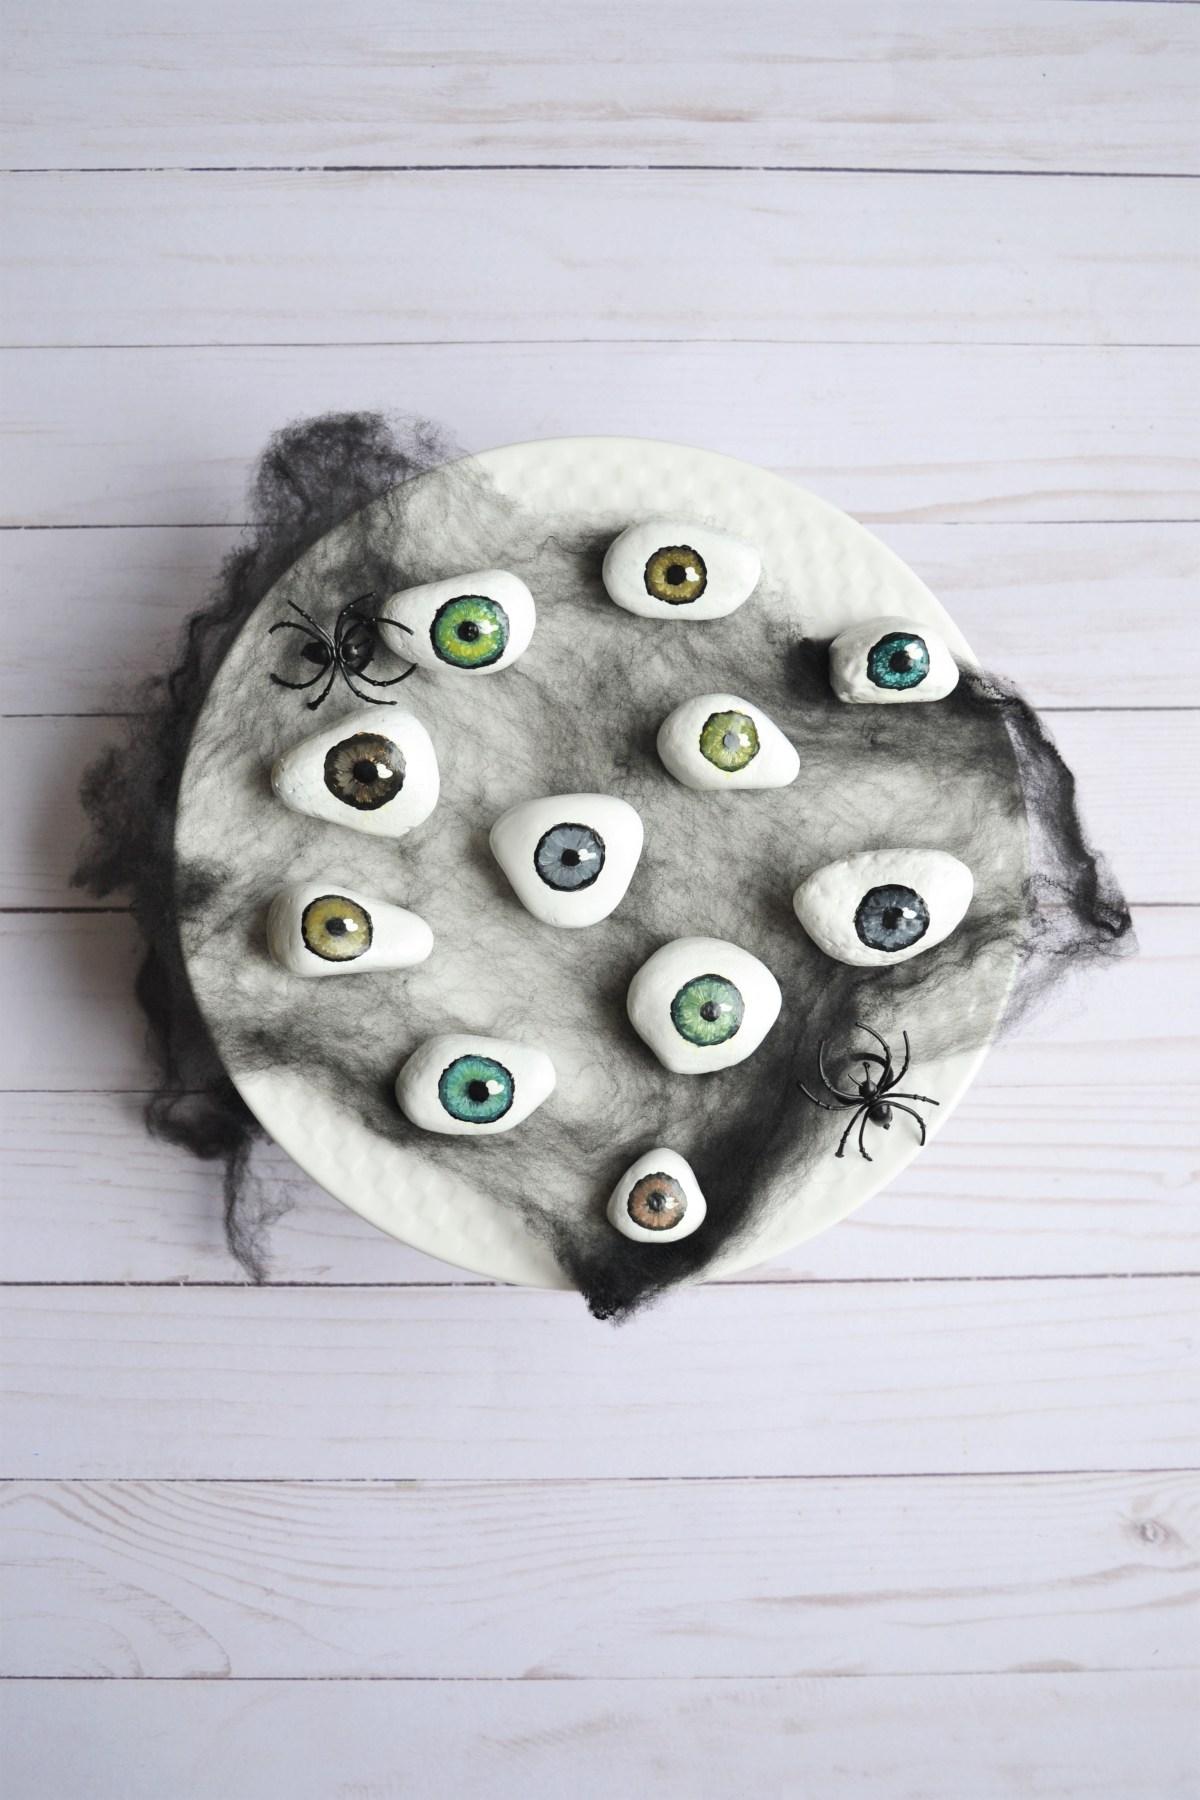 DIY Halloween Decorations Spooky Tray of Eyeballs Making